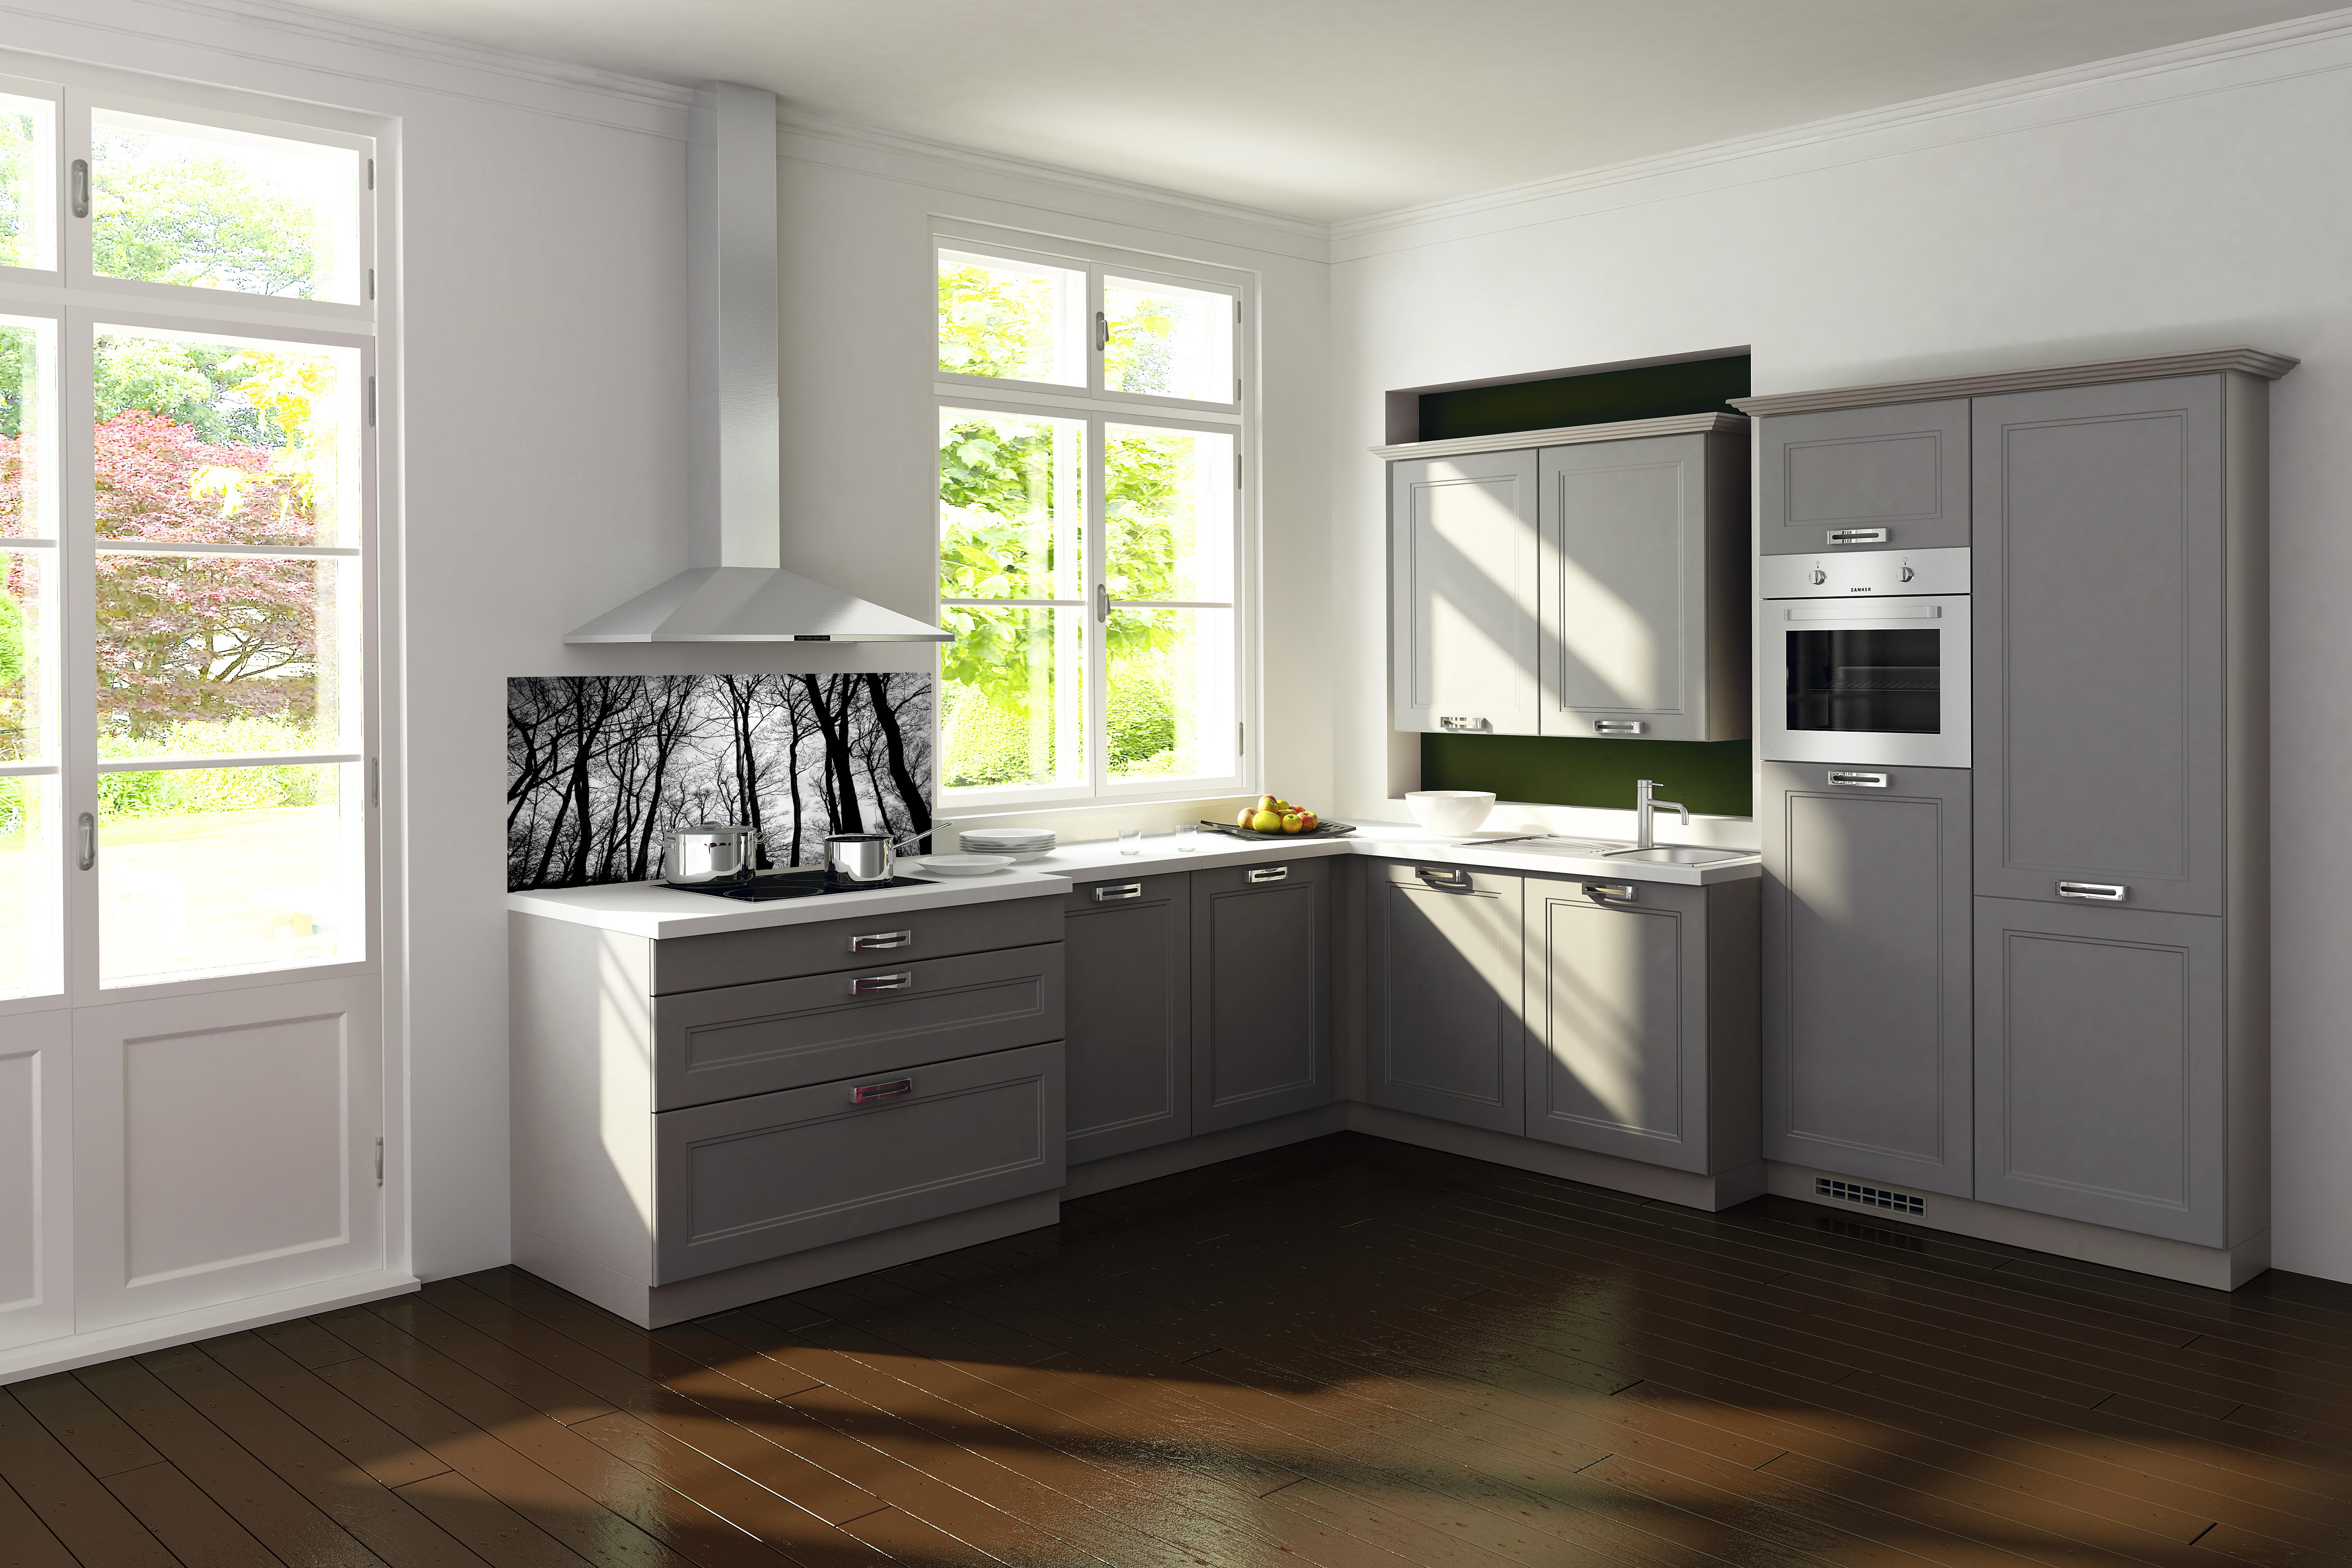 naturdesign f r die k che k che co. Black Bedroom Furniture Sets. Home Design Ideas